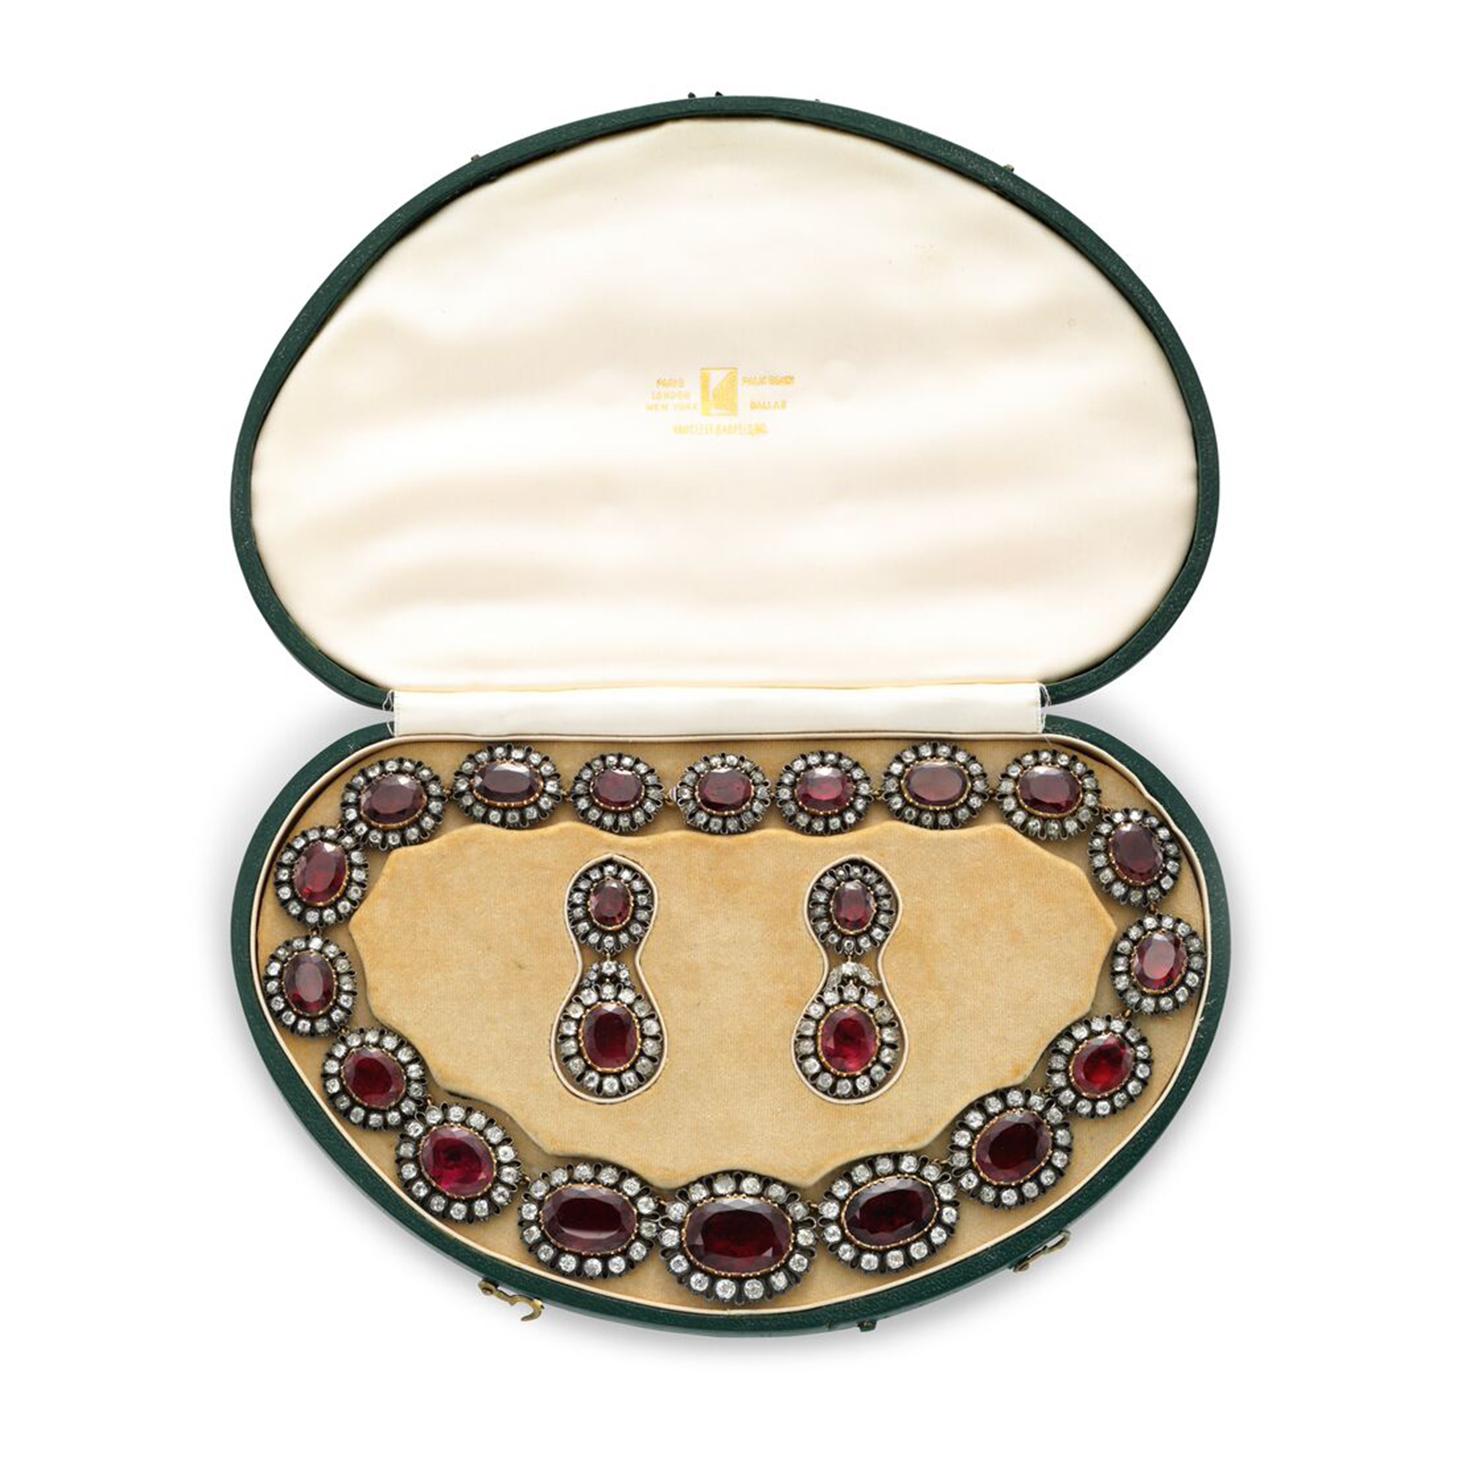 A 19th Century Topaz and Diamond Necklace, with ear pendants en suite